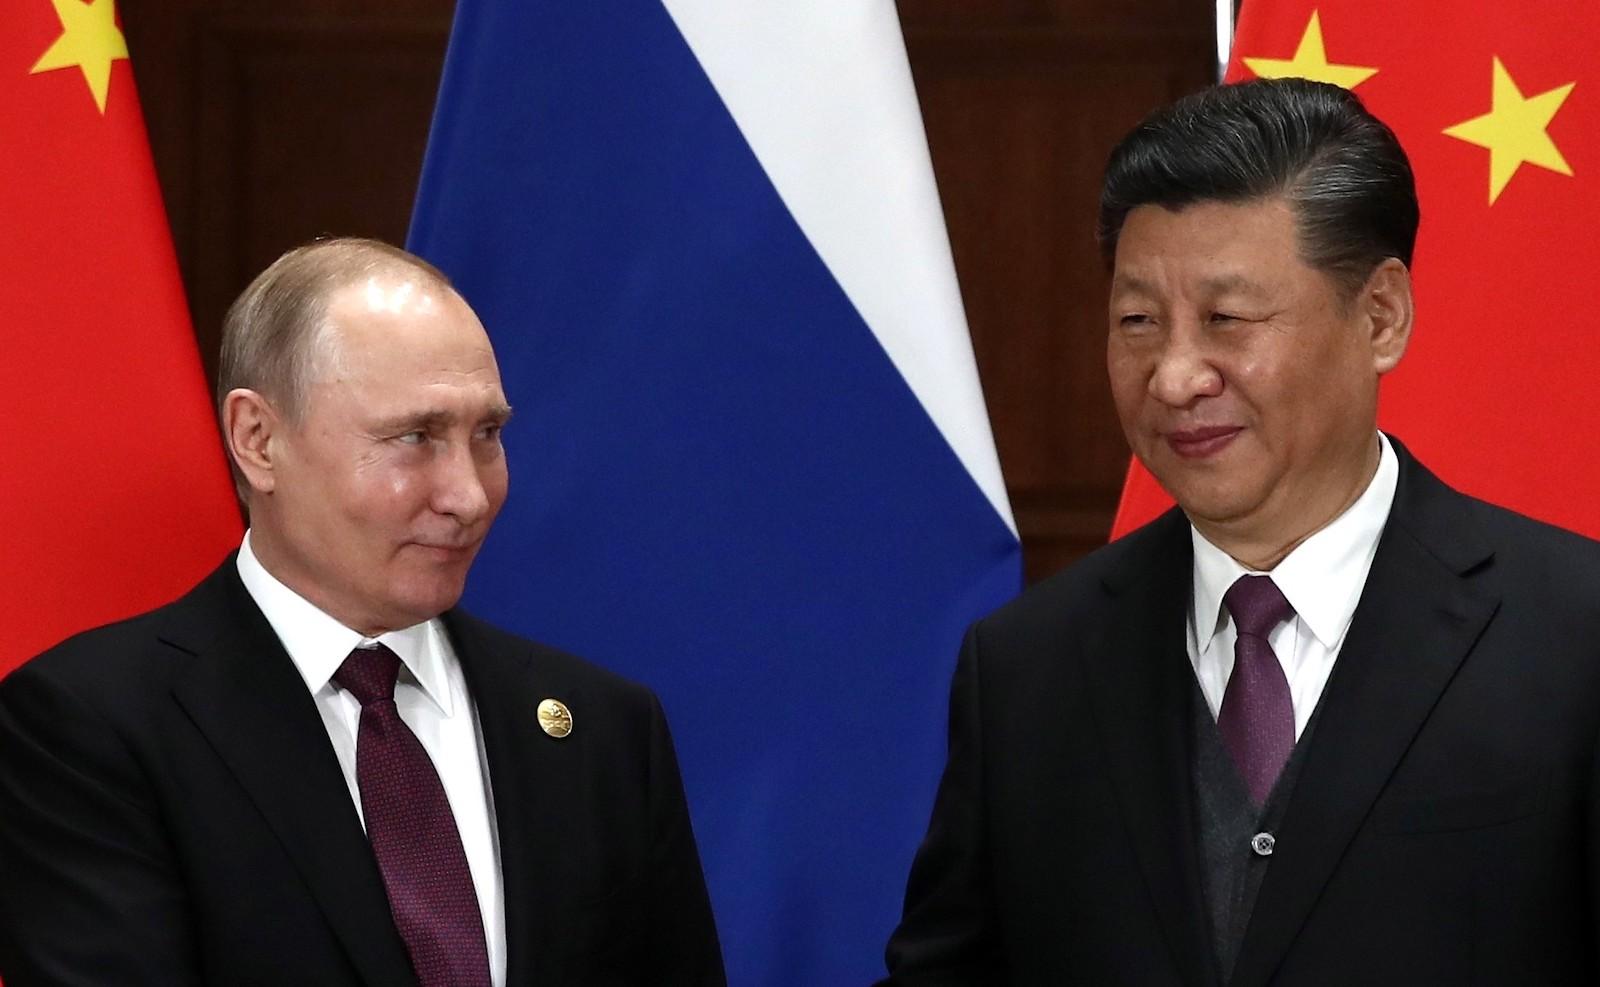 Close friends: Russia's Vladimir Putin and China's Xi Jinping (Photo: TASS via Kremlin.ru)